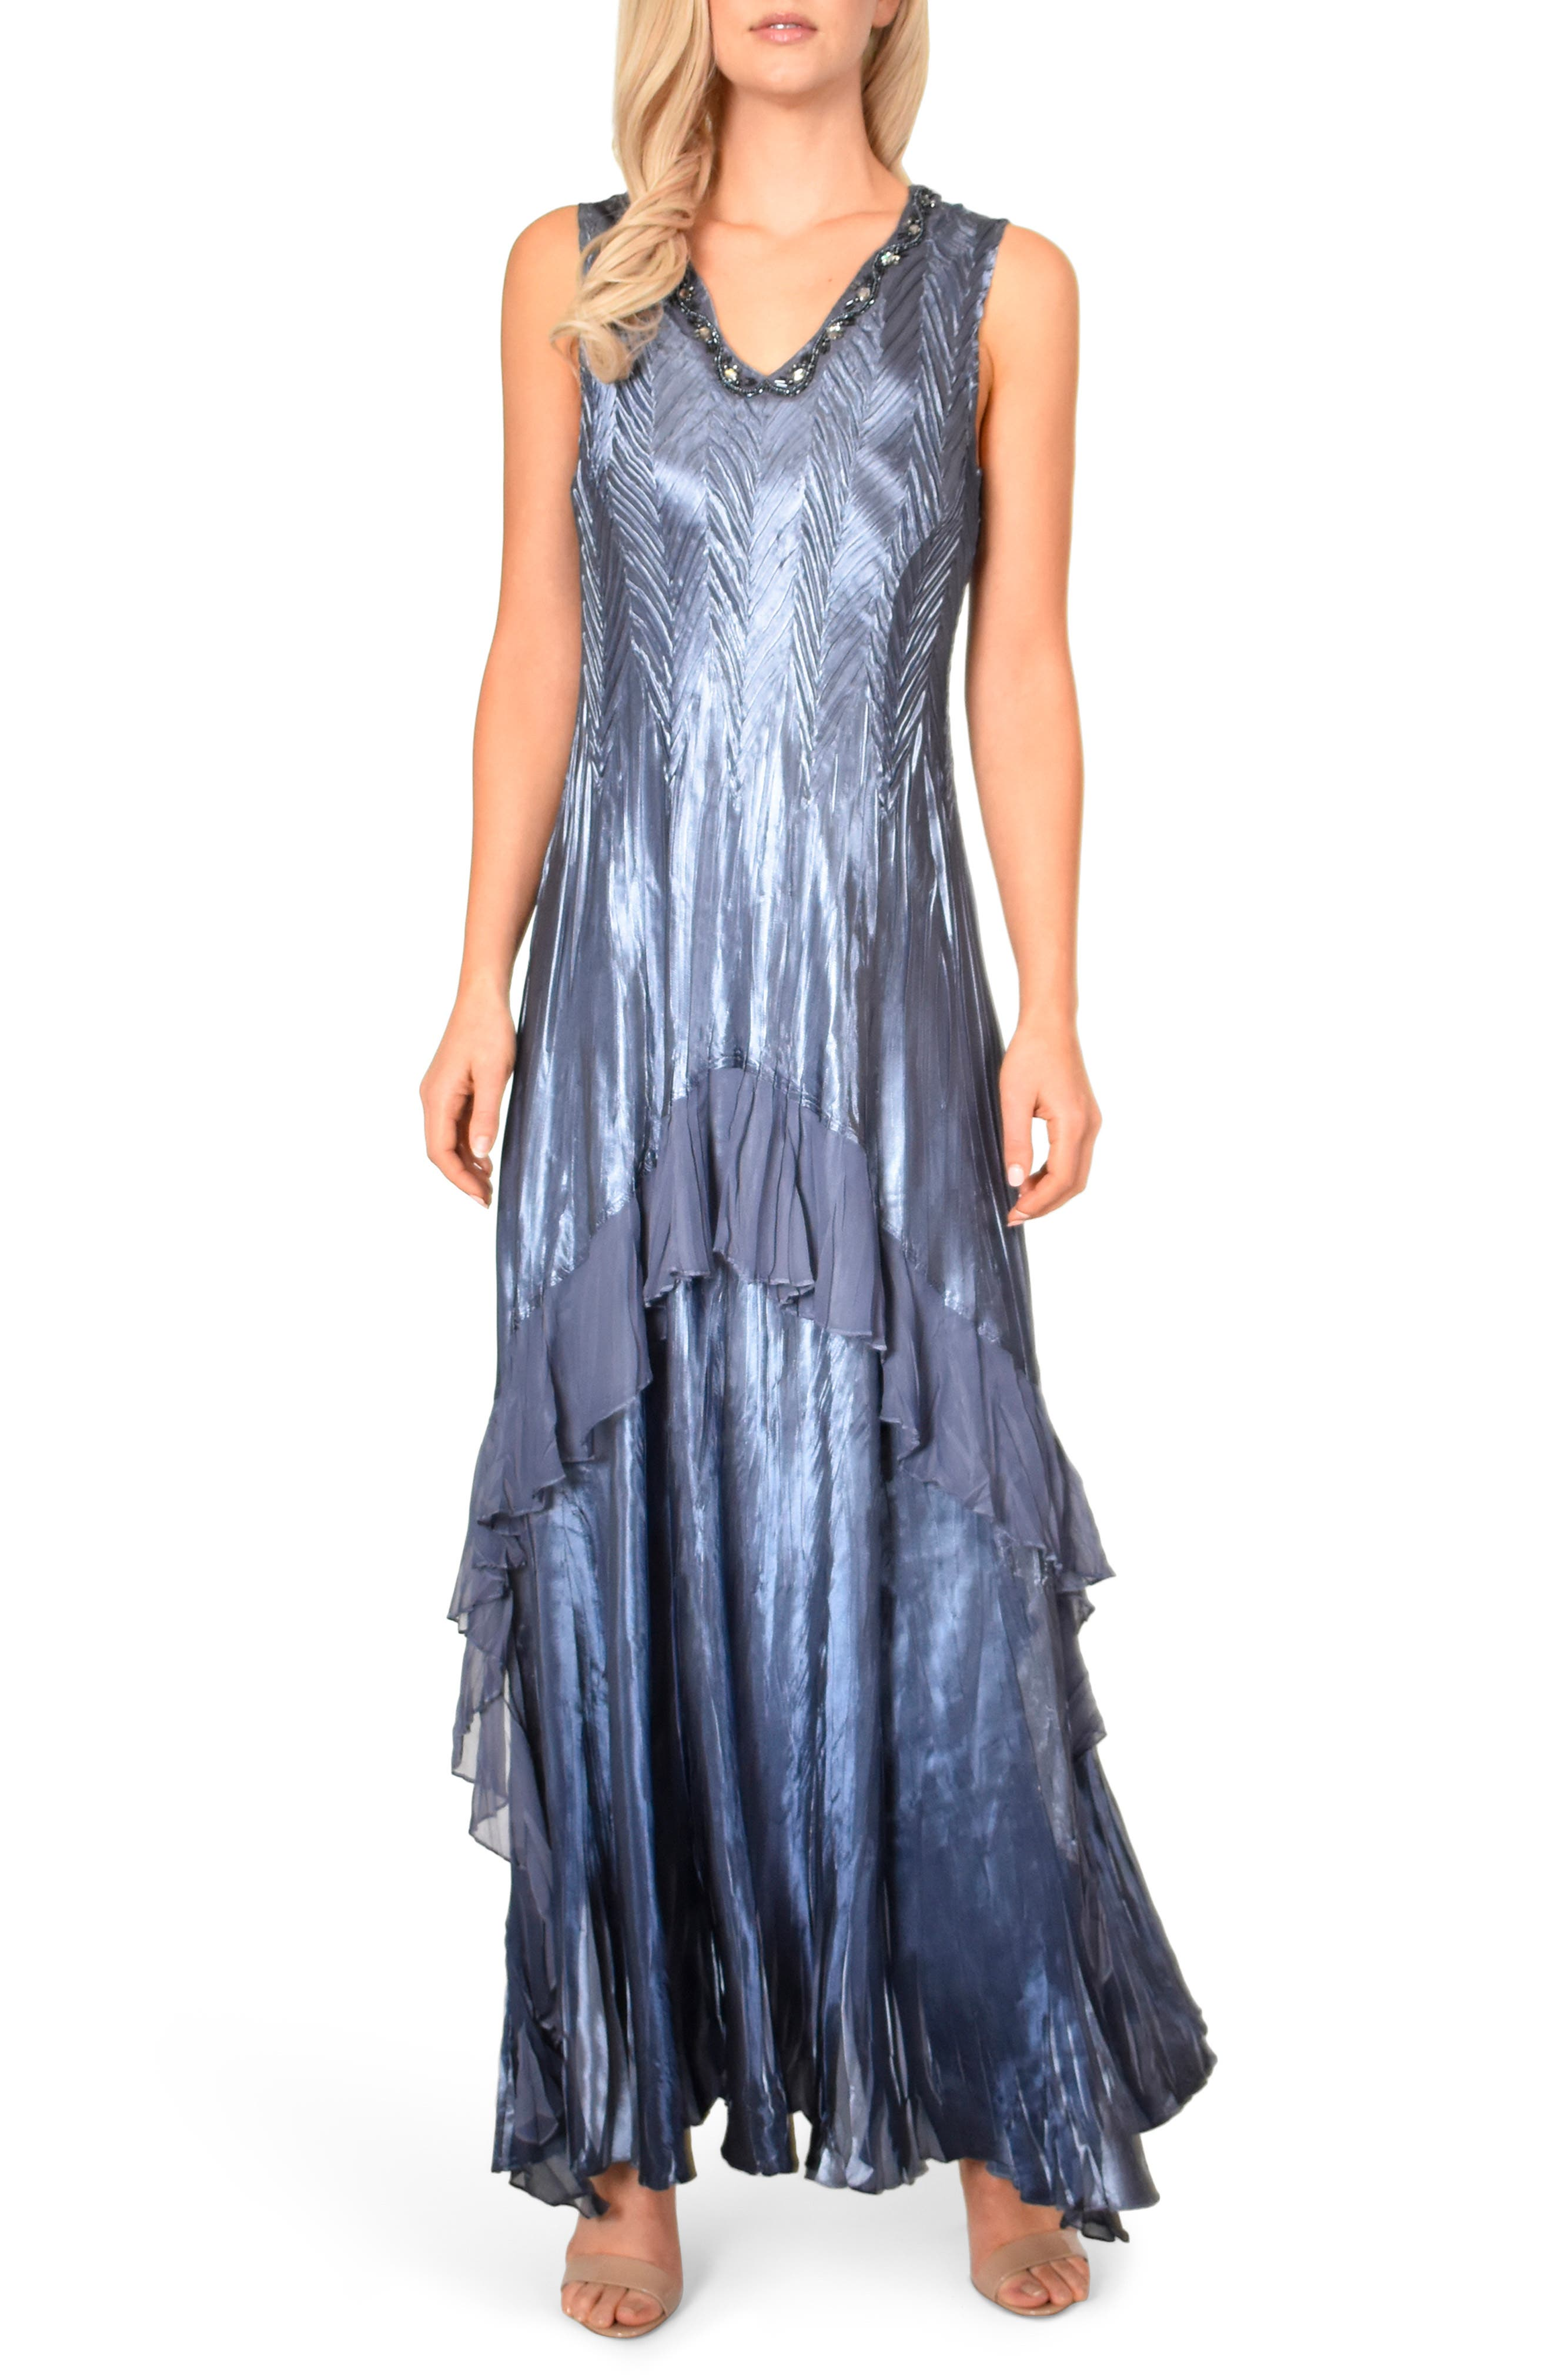 KOMAROV, Beaded V-Neck Charmeuse & Chiffon Evening Dress with Wrap, Alternate thumbnail 5, color, PURPLE SAGE BLUE OMBRE